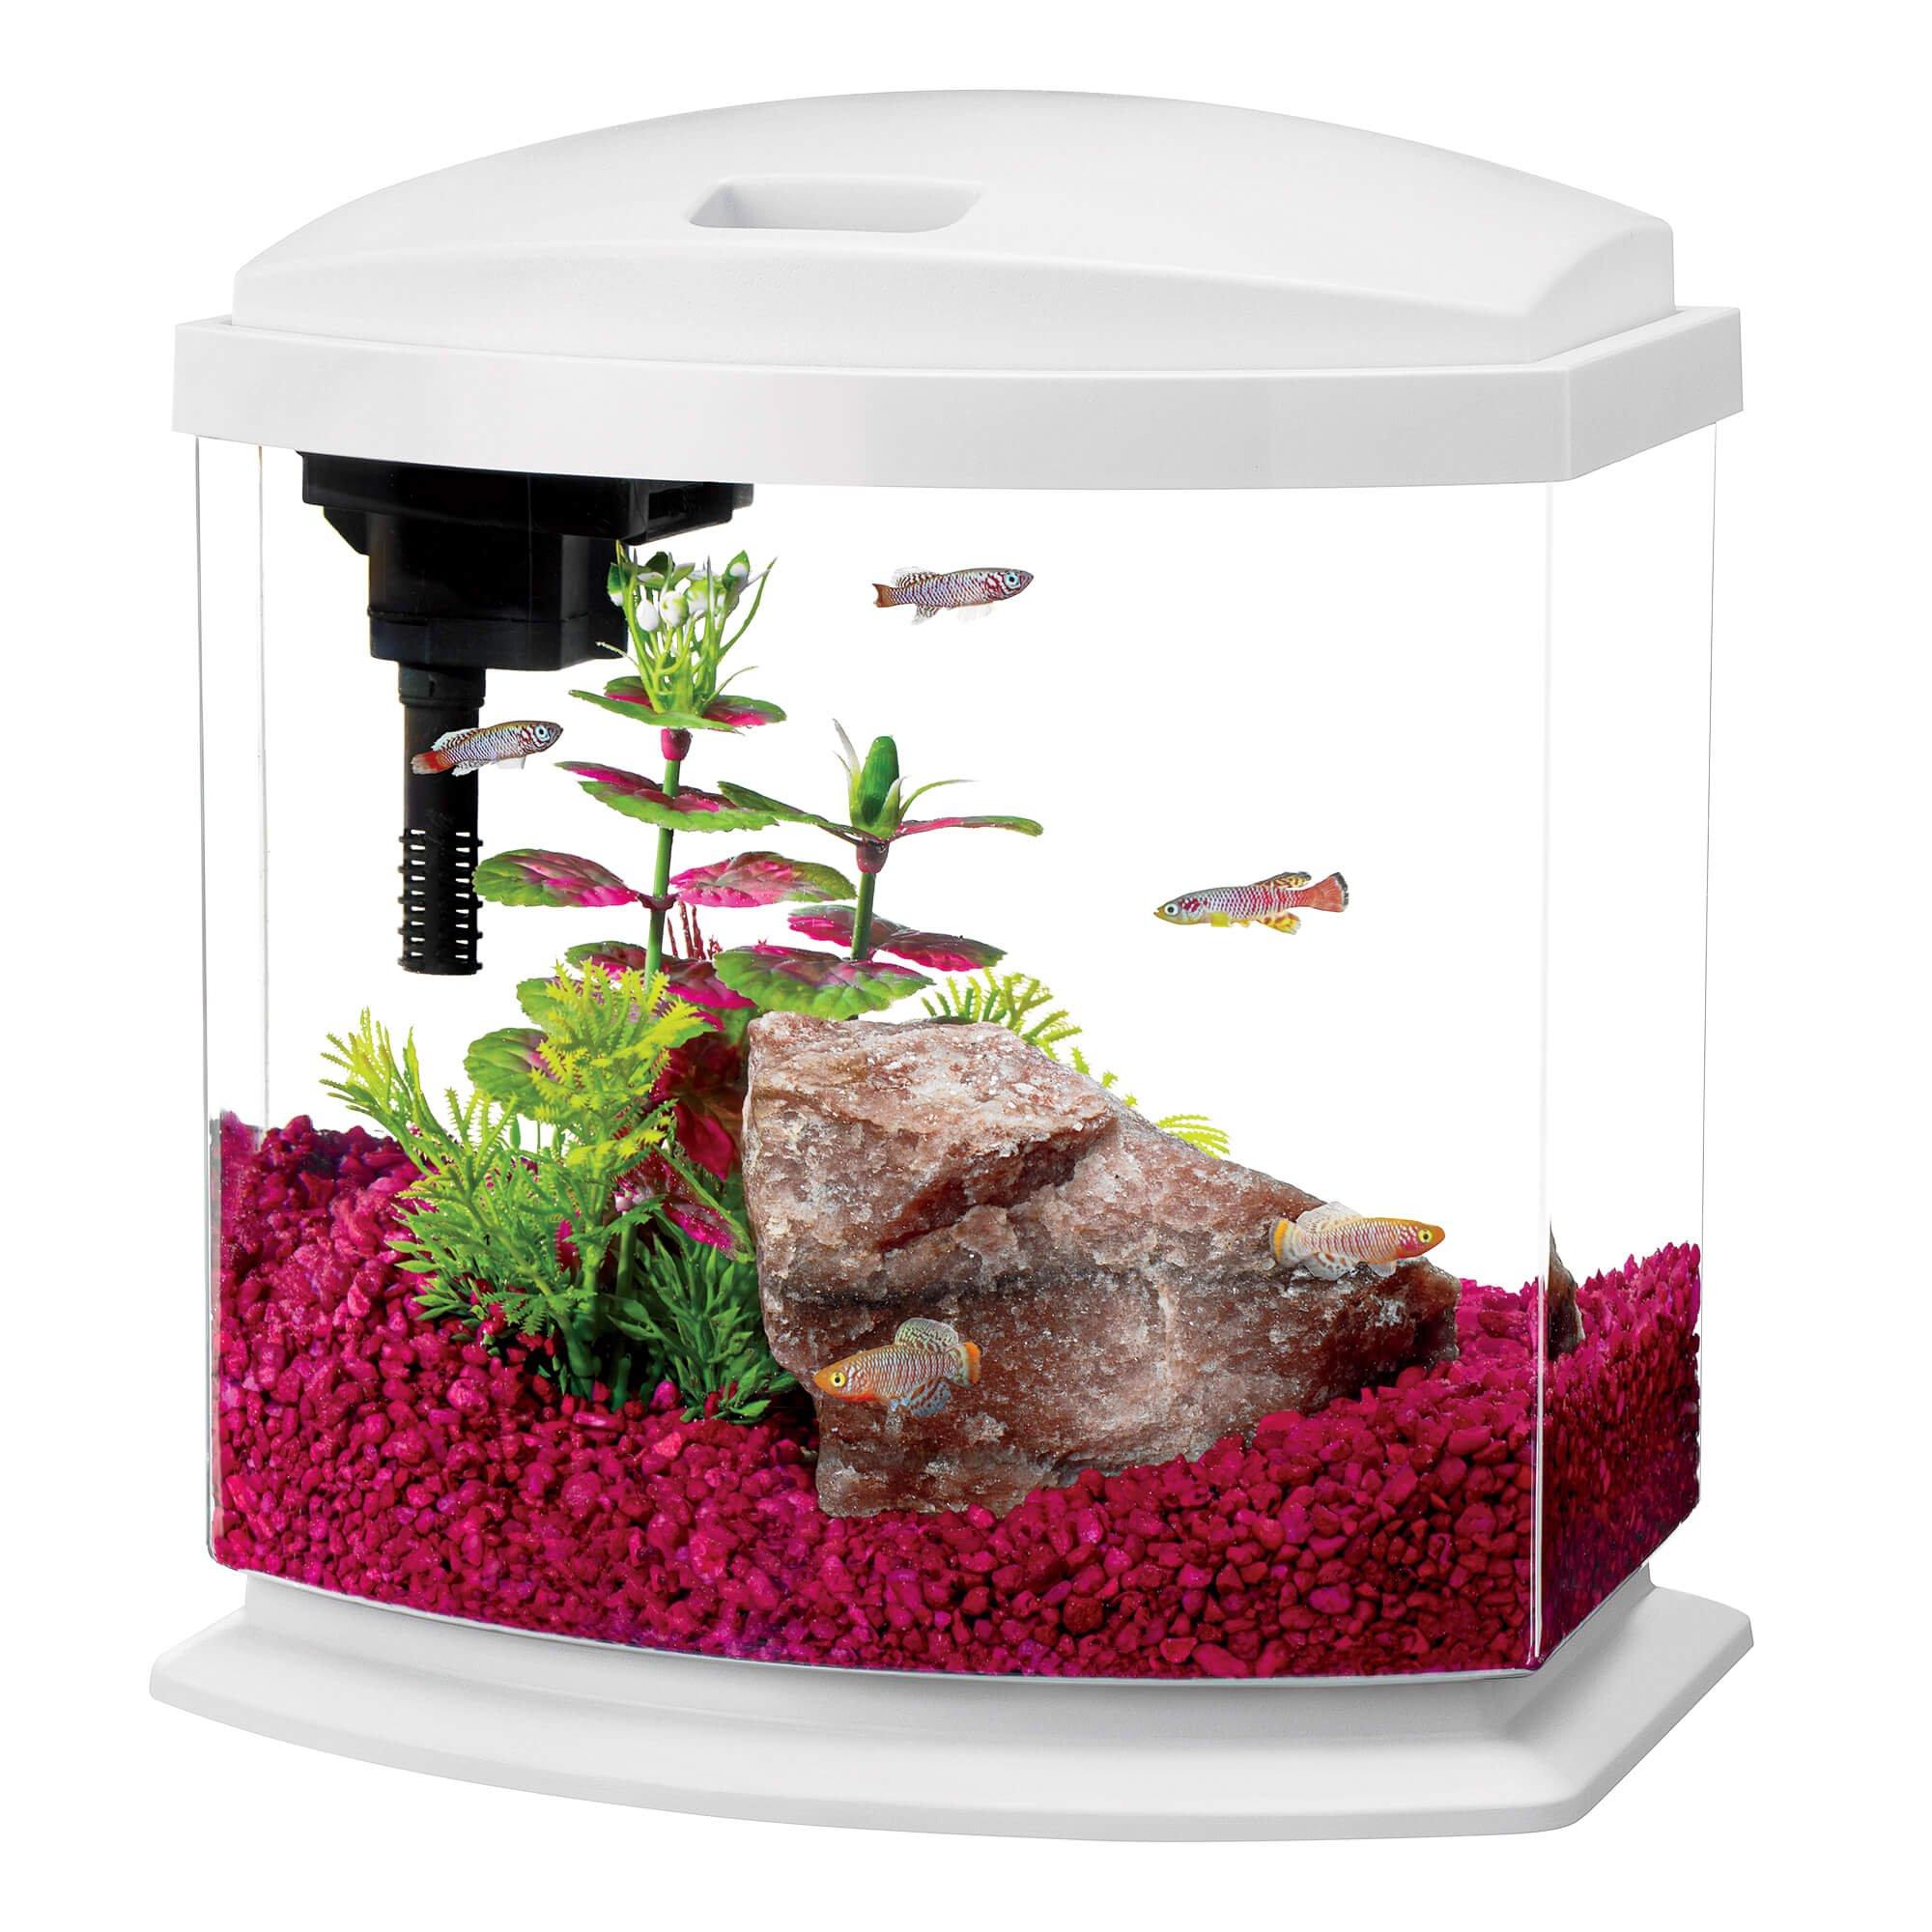 Aqueon 2 5 Gallon Minibow Led Desktop Fish Aquarium Kit White Petco Aquarium Kit Aquarium Fish Tank